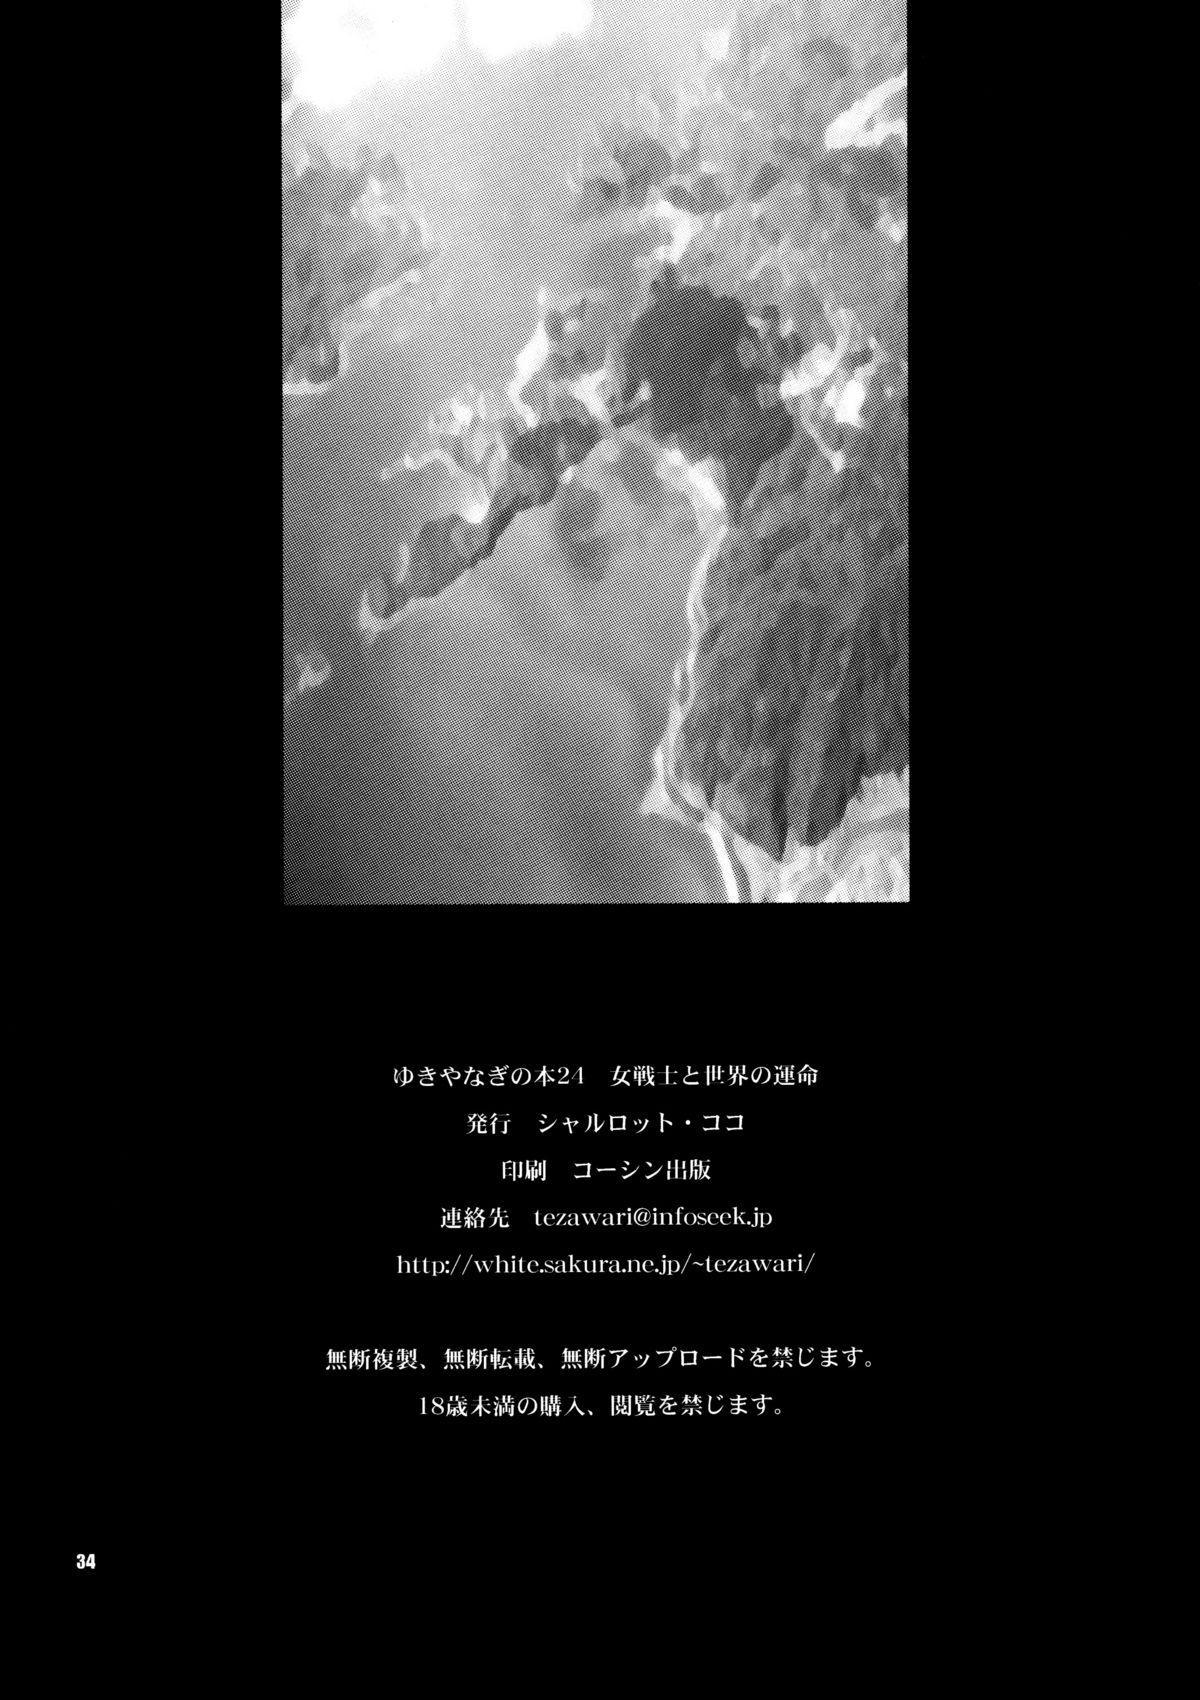 Onna Senshi to Sekai no Unmei | Female Warrior and Fate of the World 31